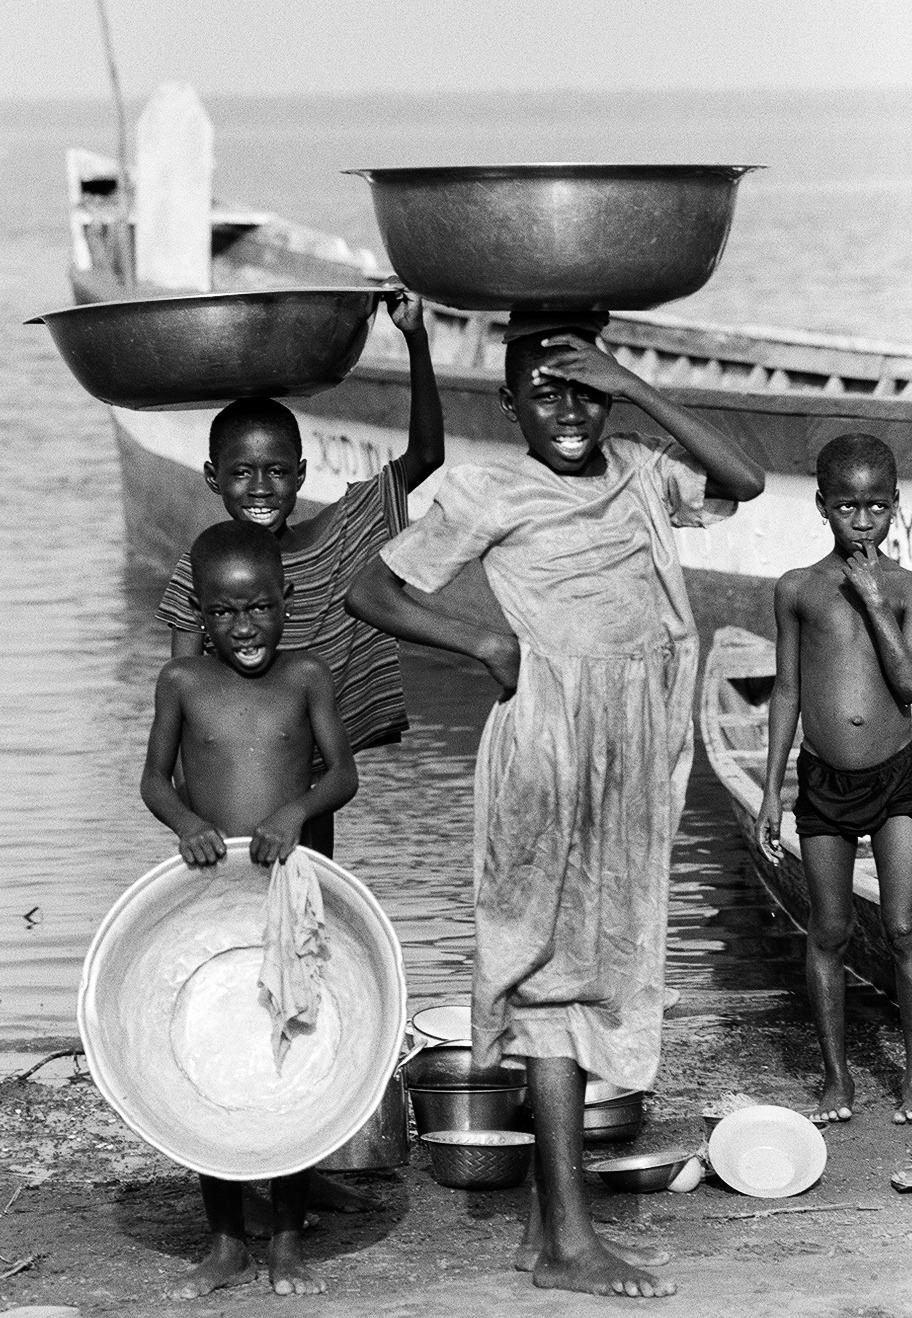 4. ghana-childslavery.jpg